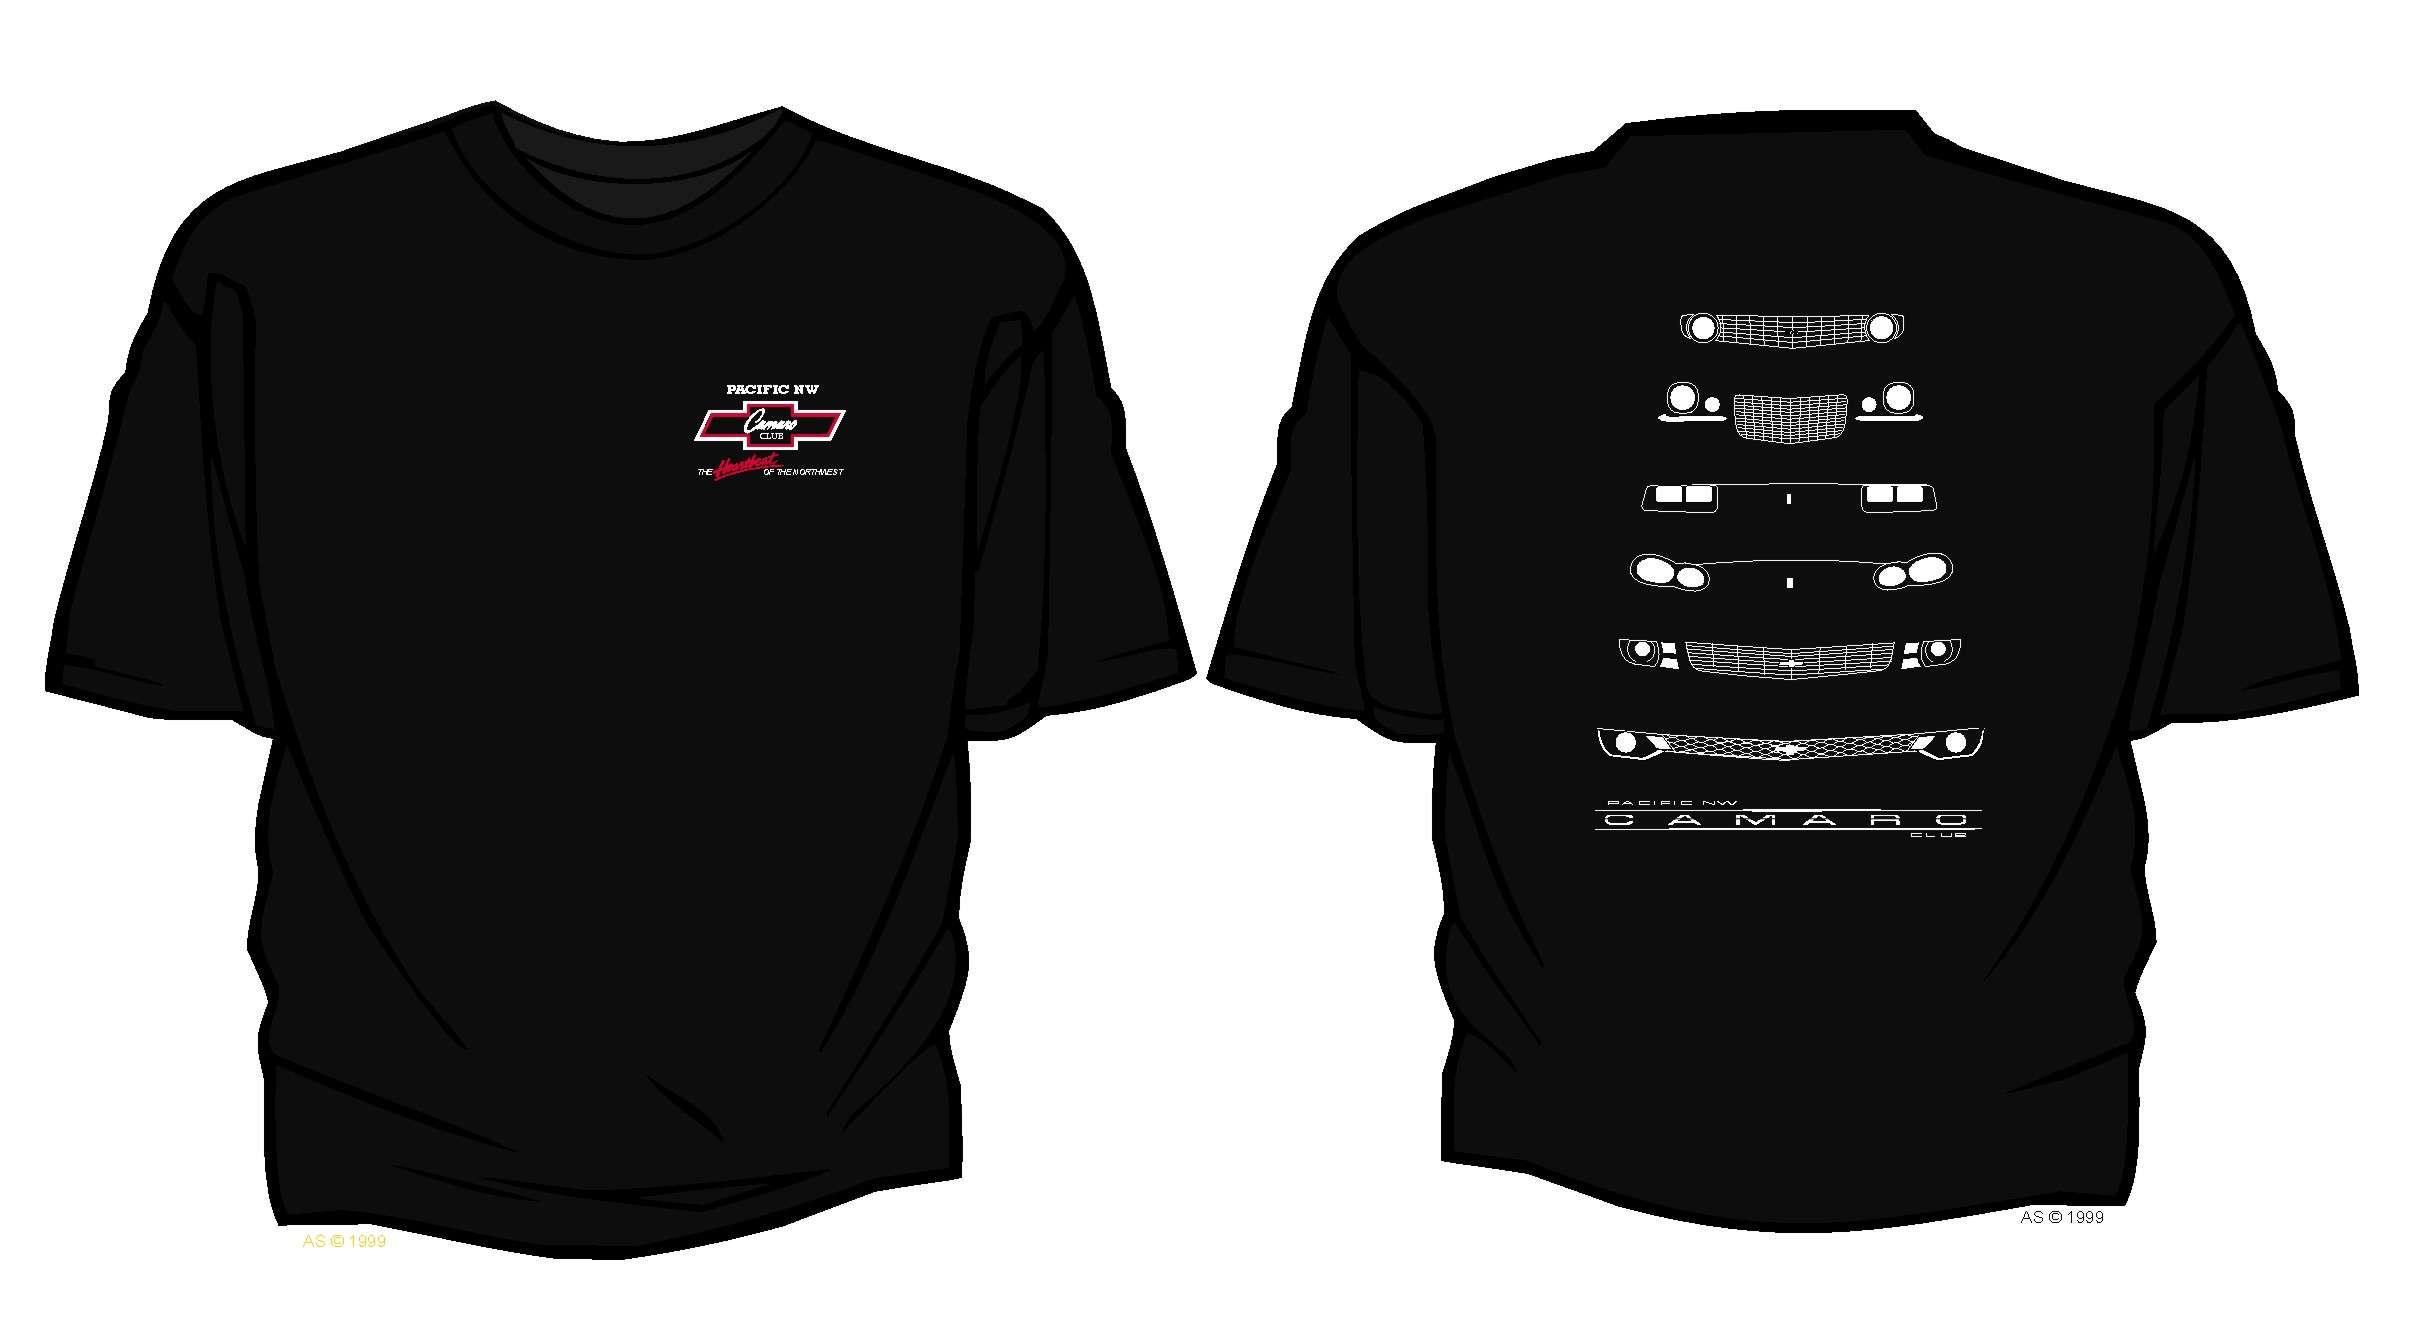 2015 PNWCC T-Shirt